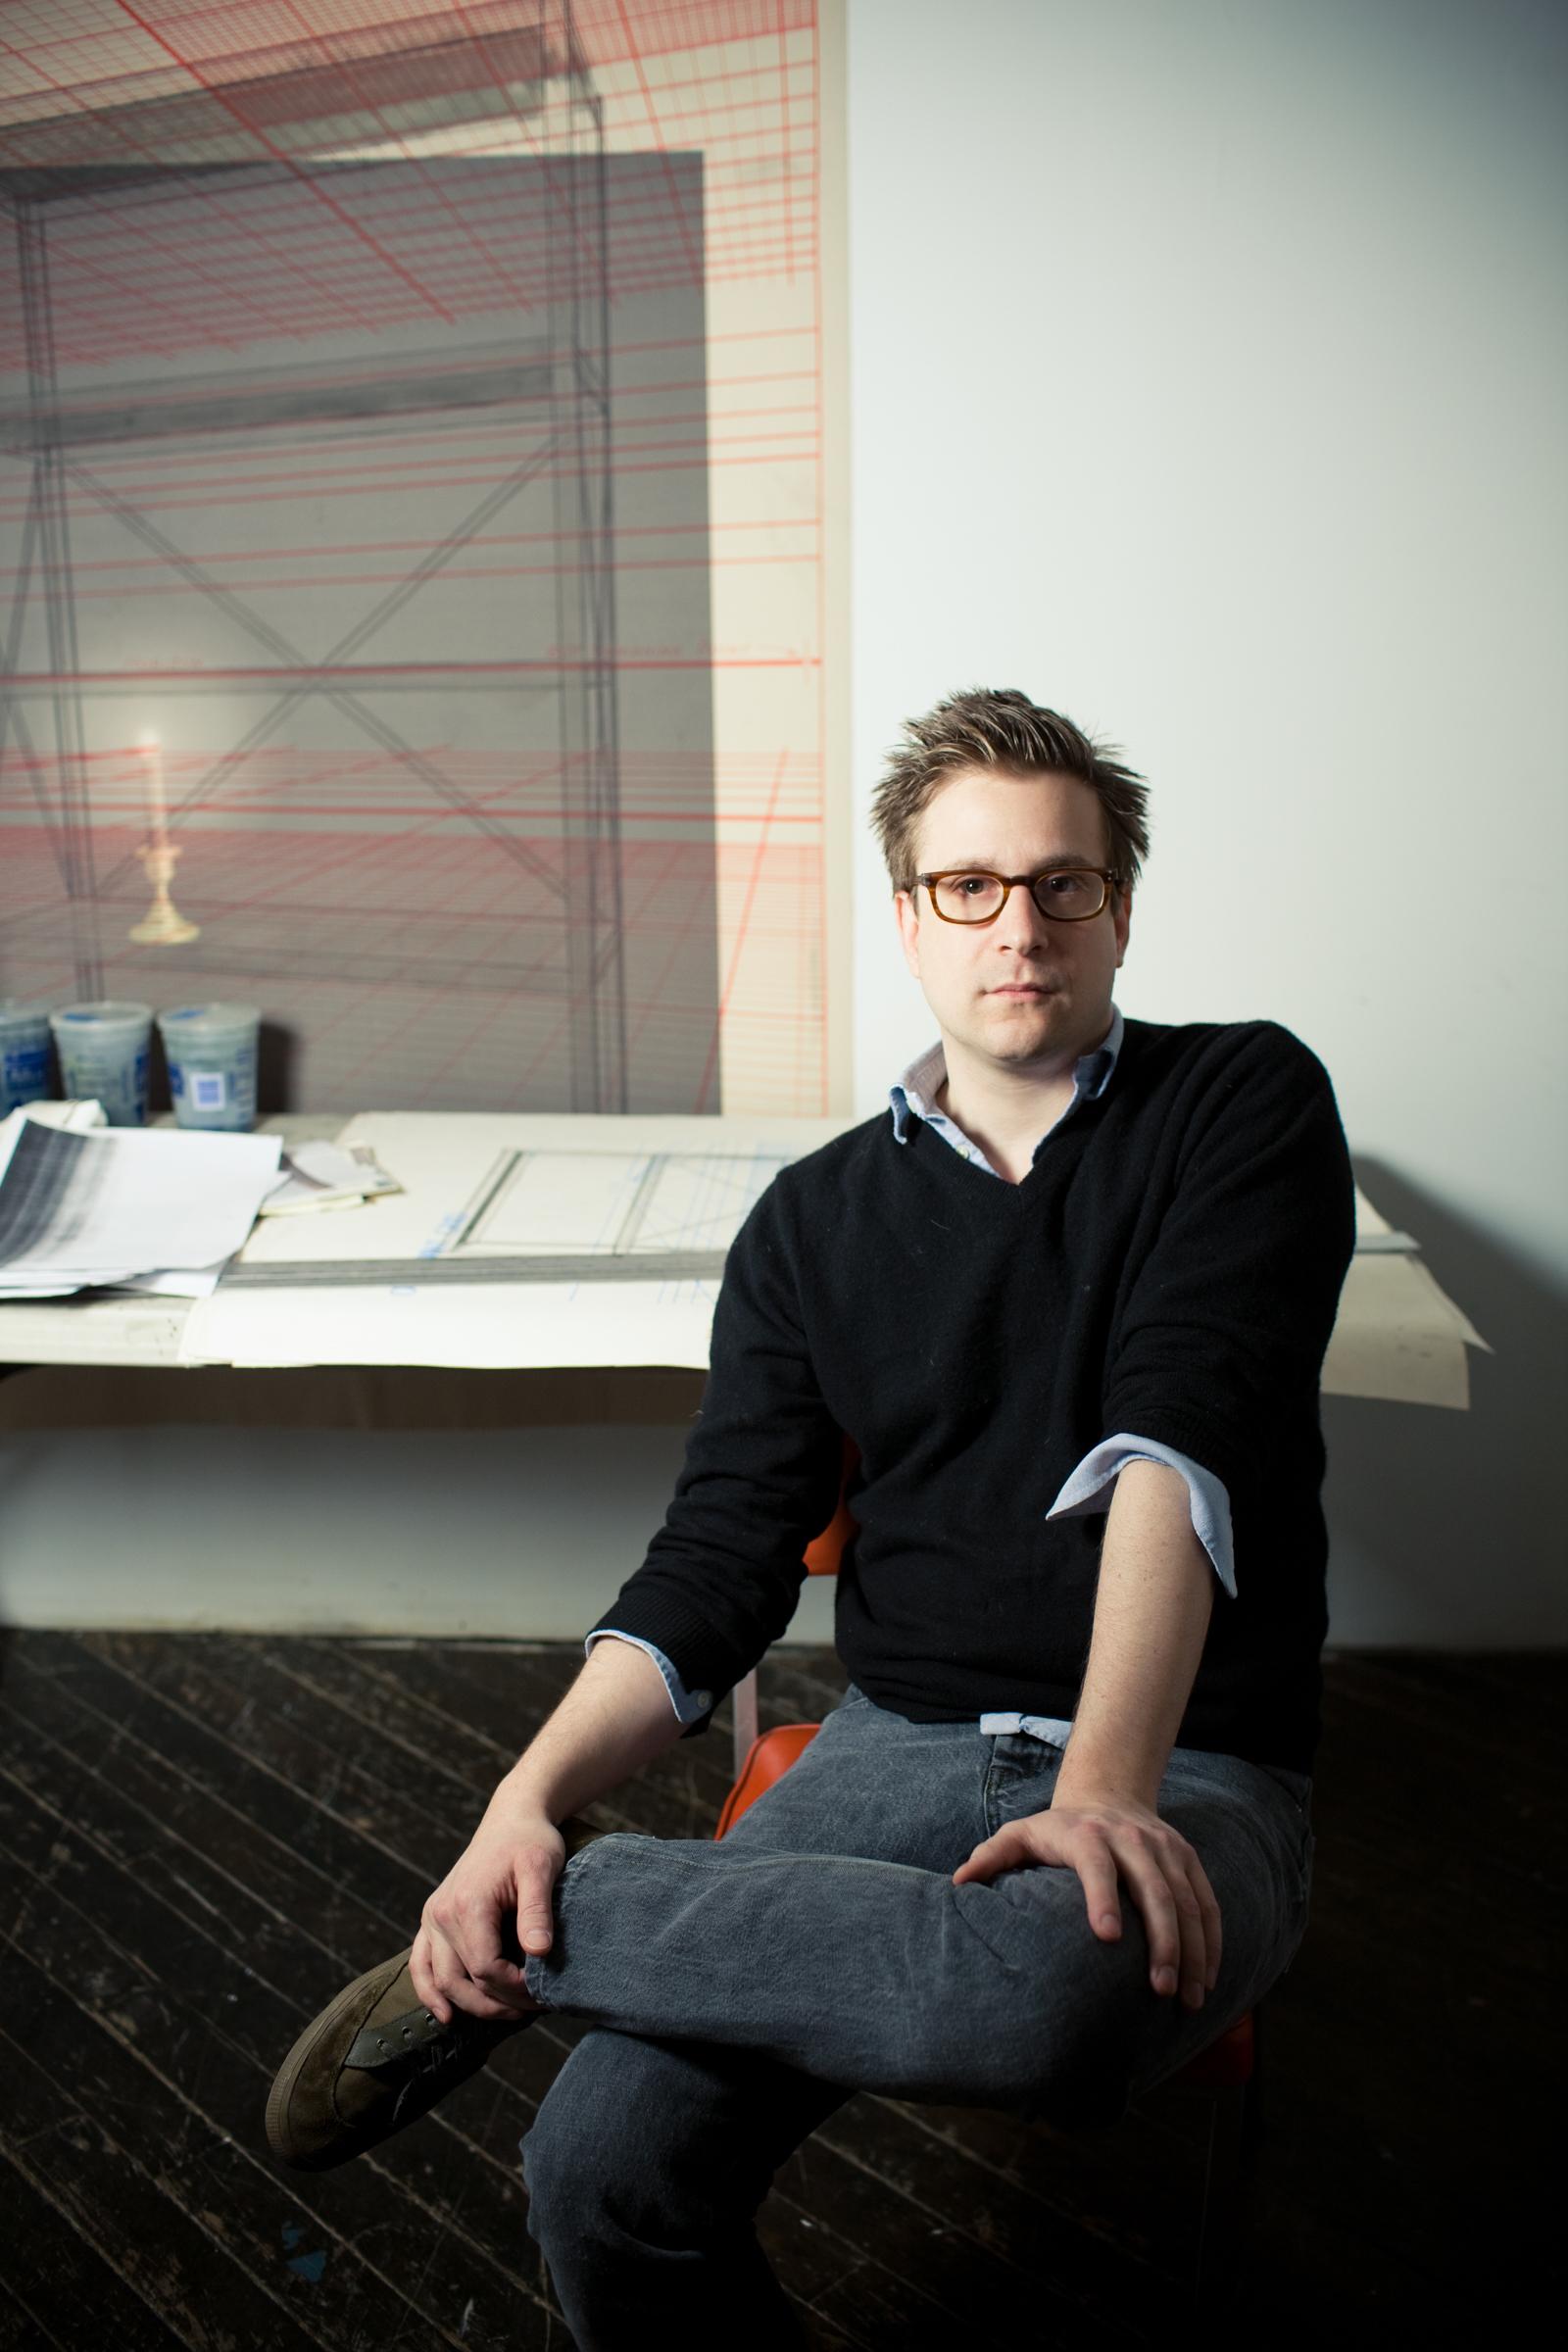 Kevin Zucker, artist